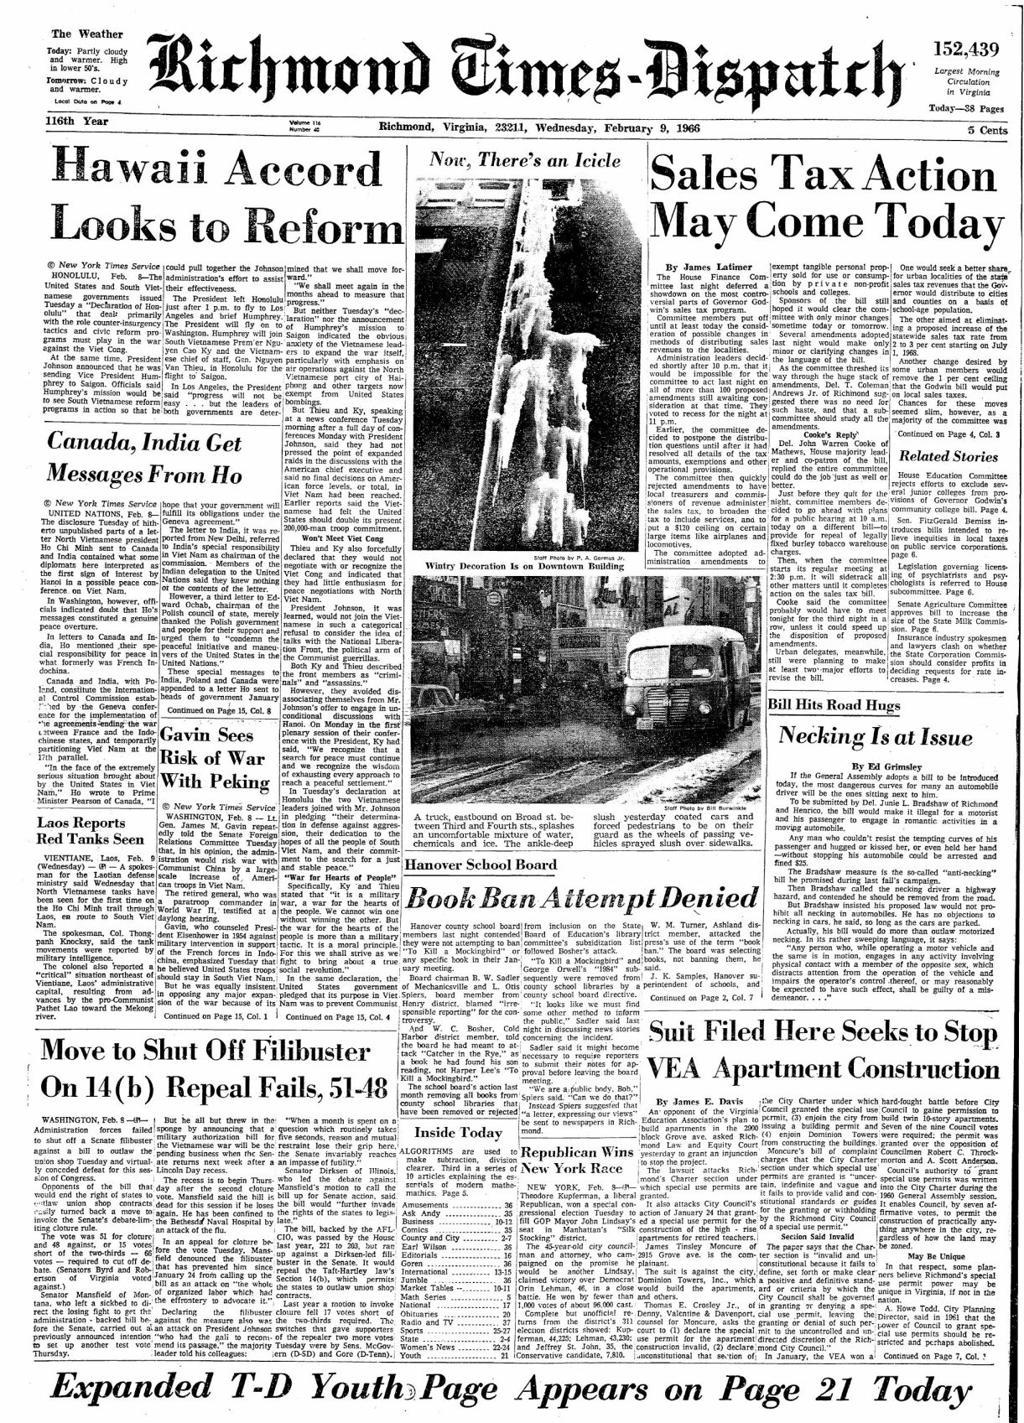 In 1966, Hanover schools stirred Harper Lee's ire after banning